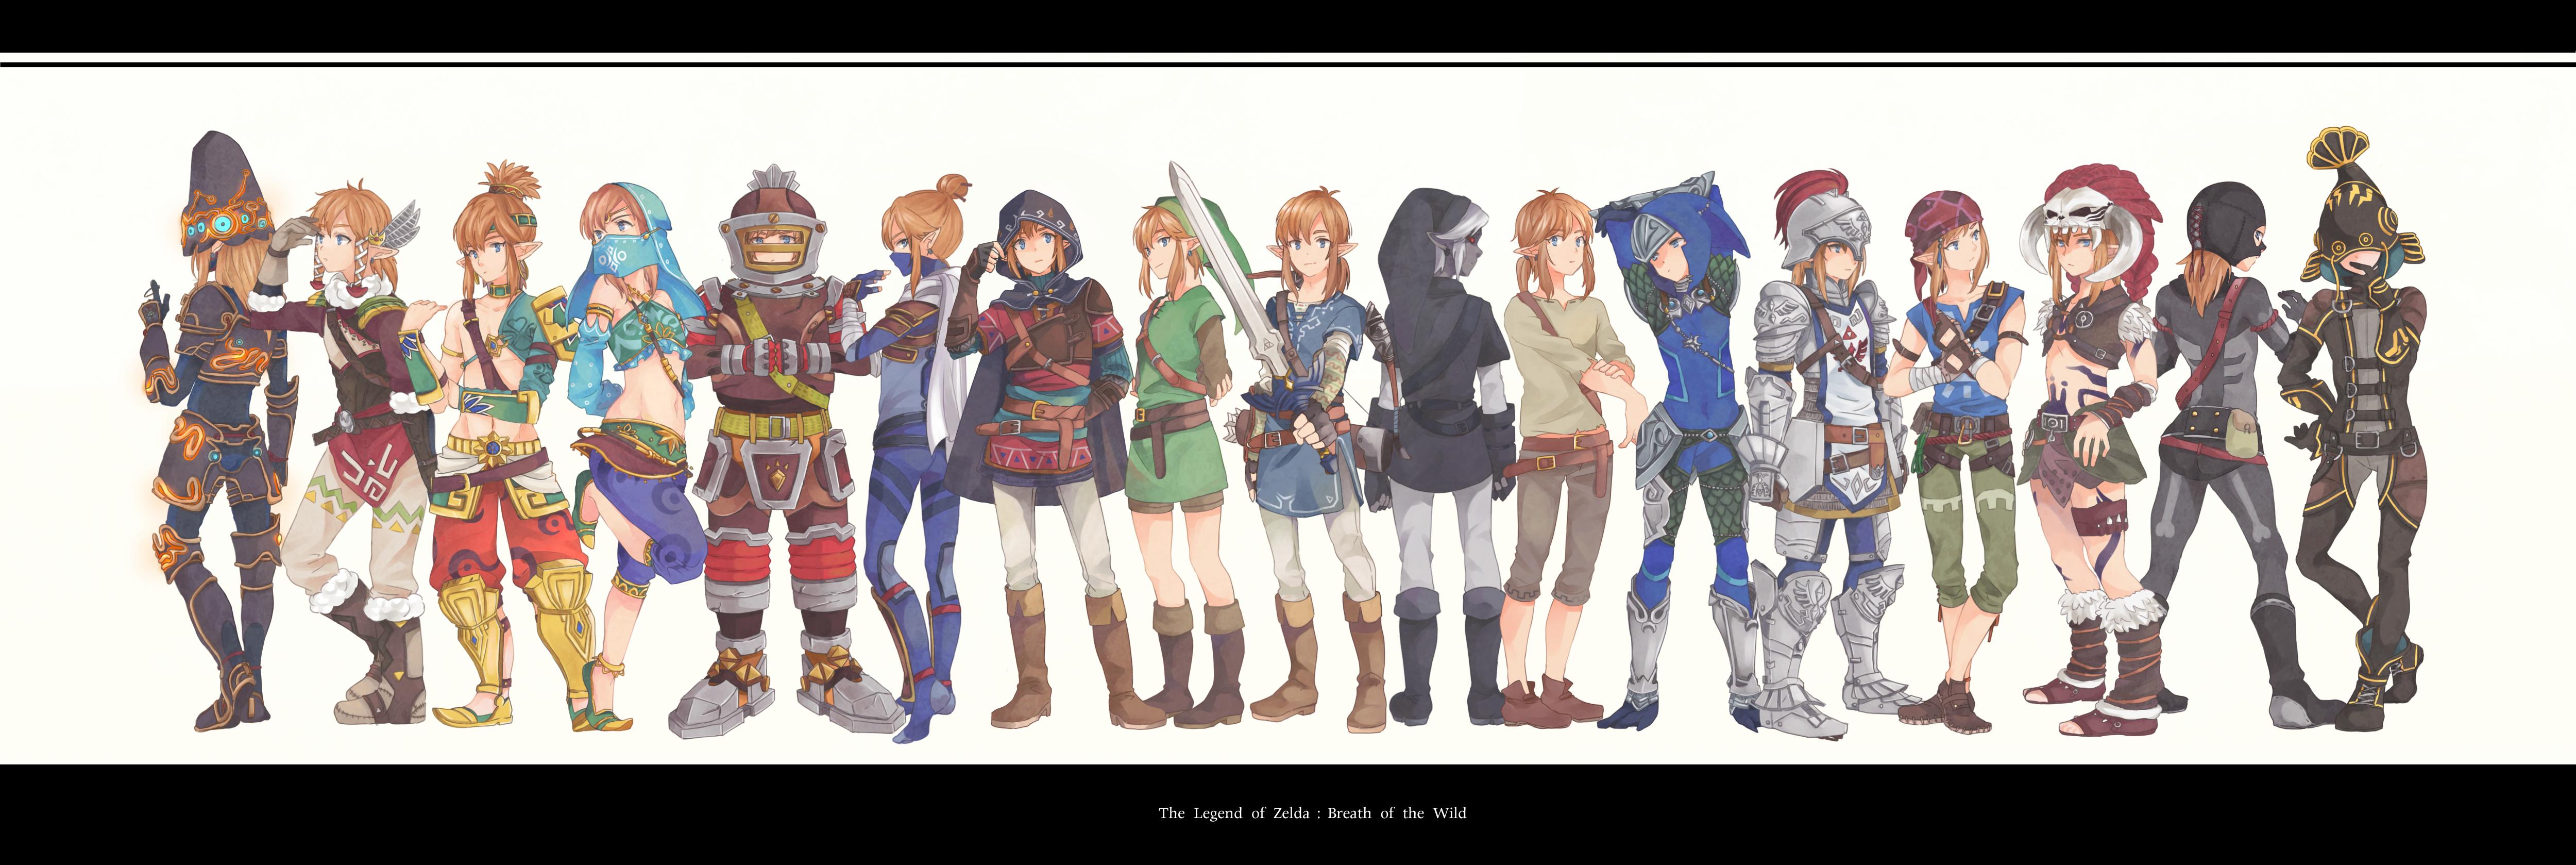 Link Gerudo Link And Dark Link The Legend Of Zelda And 1 More Drawn By Aco Co0 Danbooru